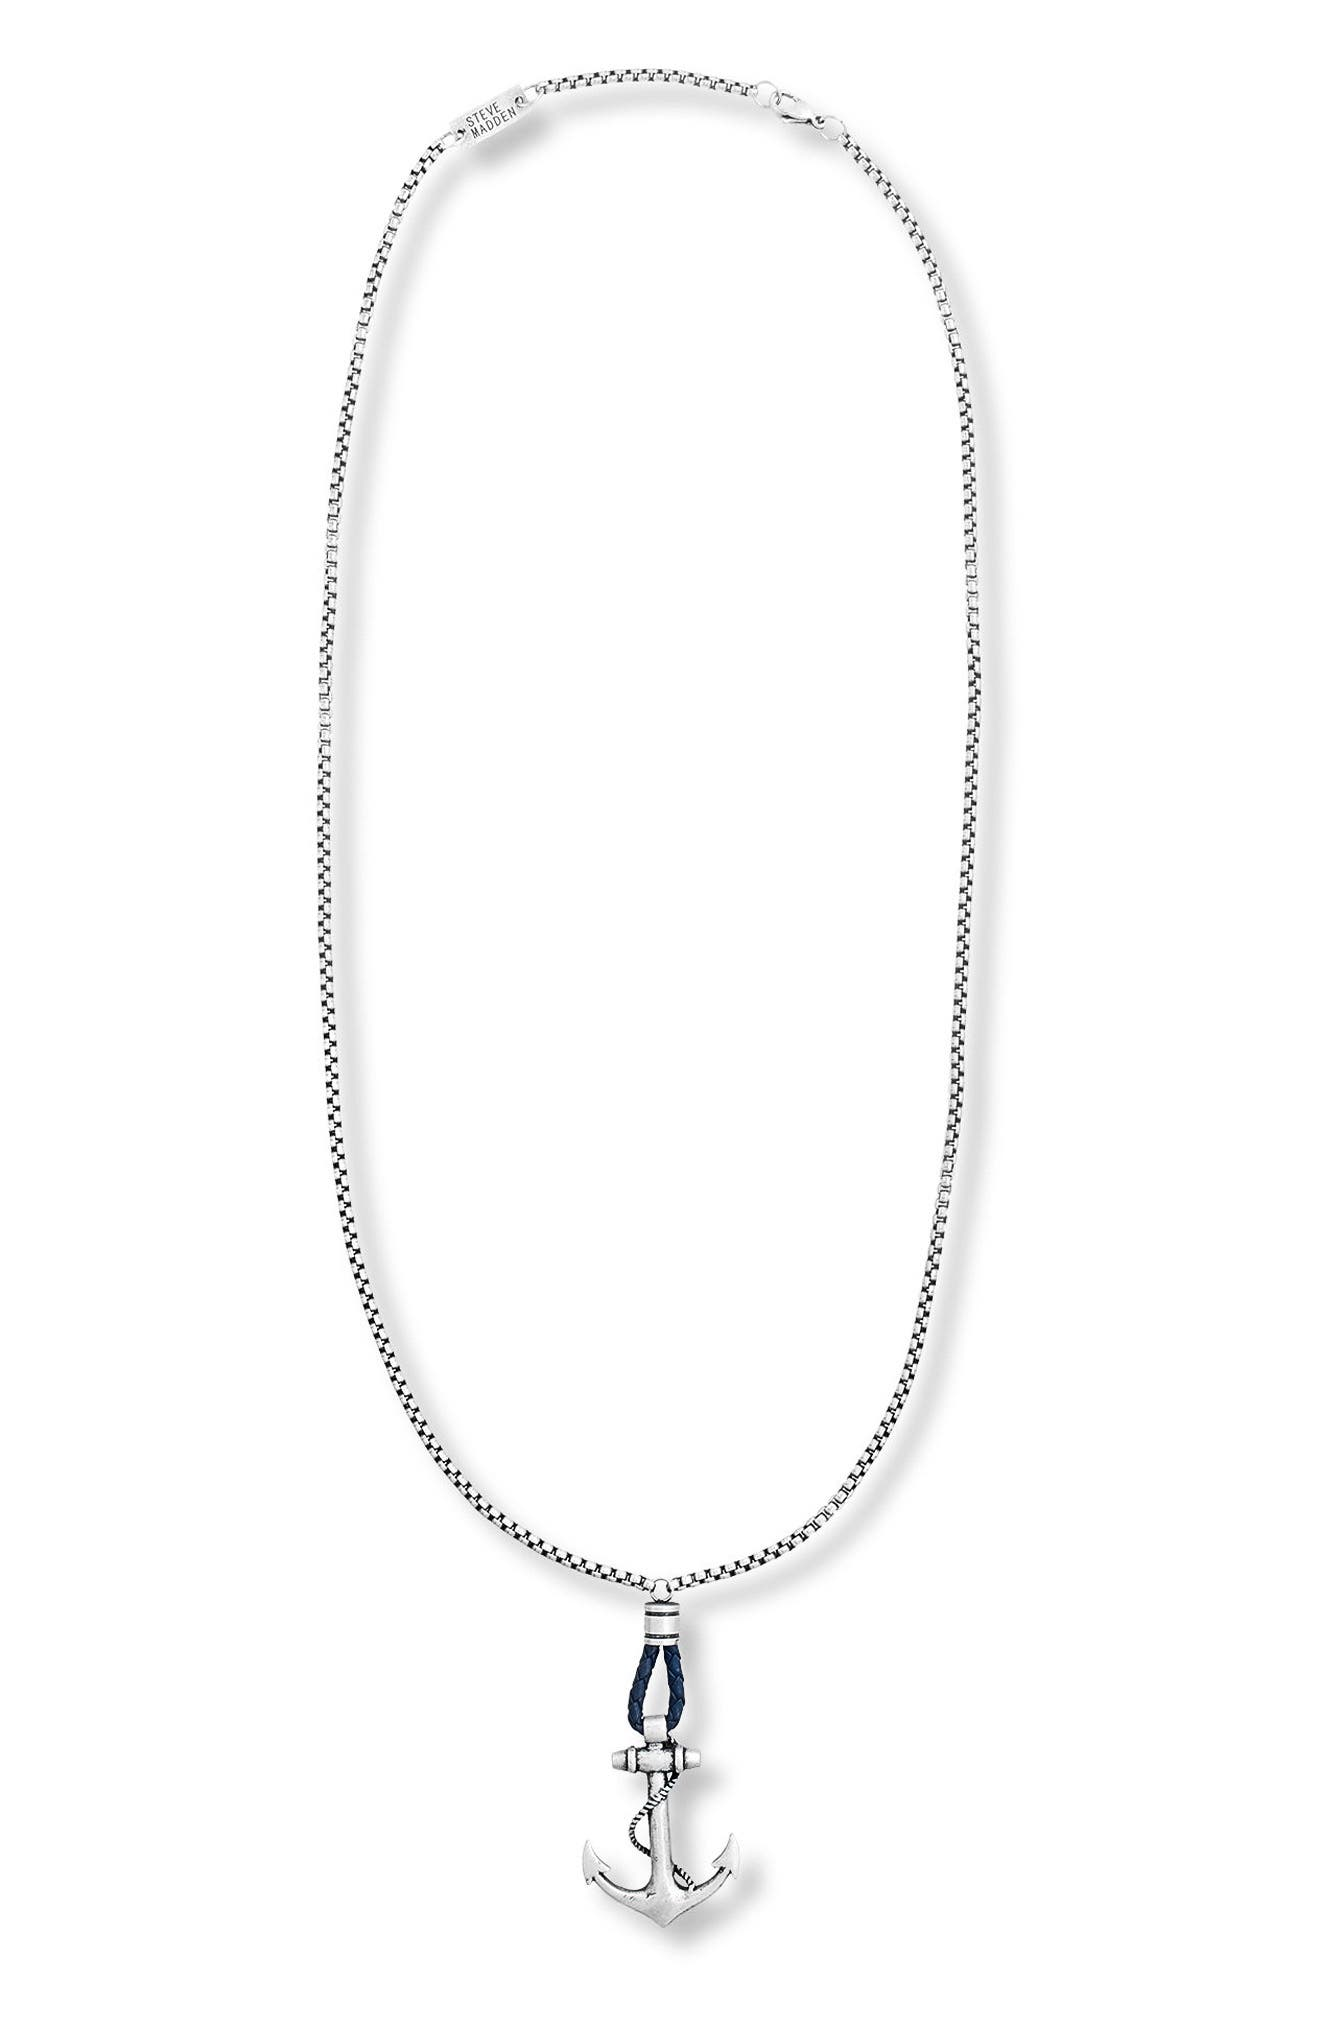 Alternate Image 1 Selected - Steve Madden Oxidized Anchor Pendant Necklace